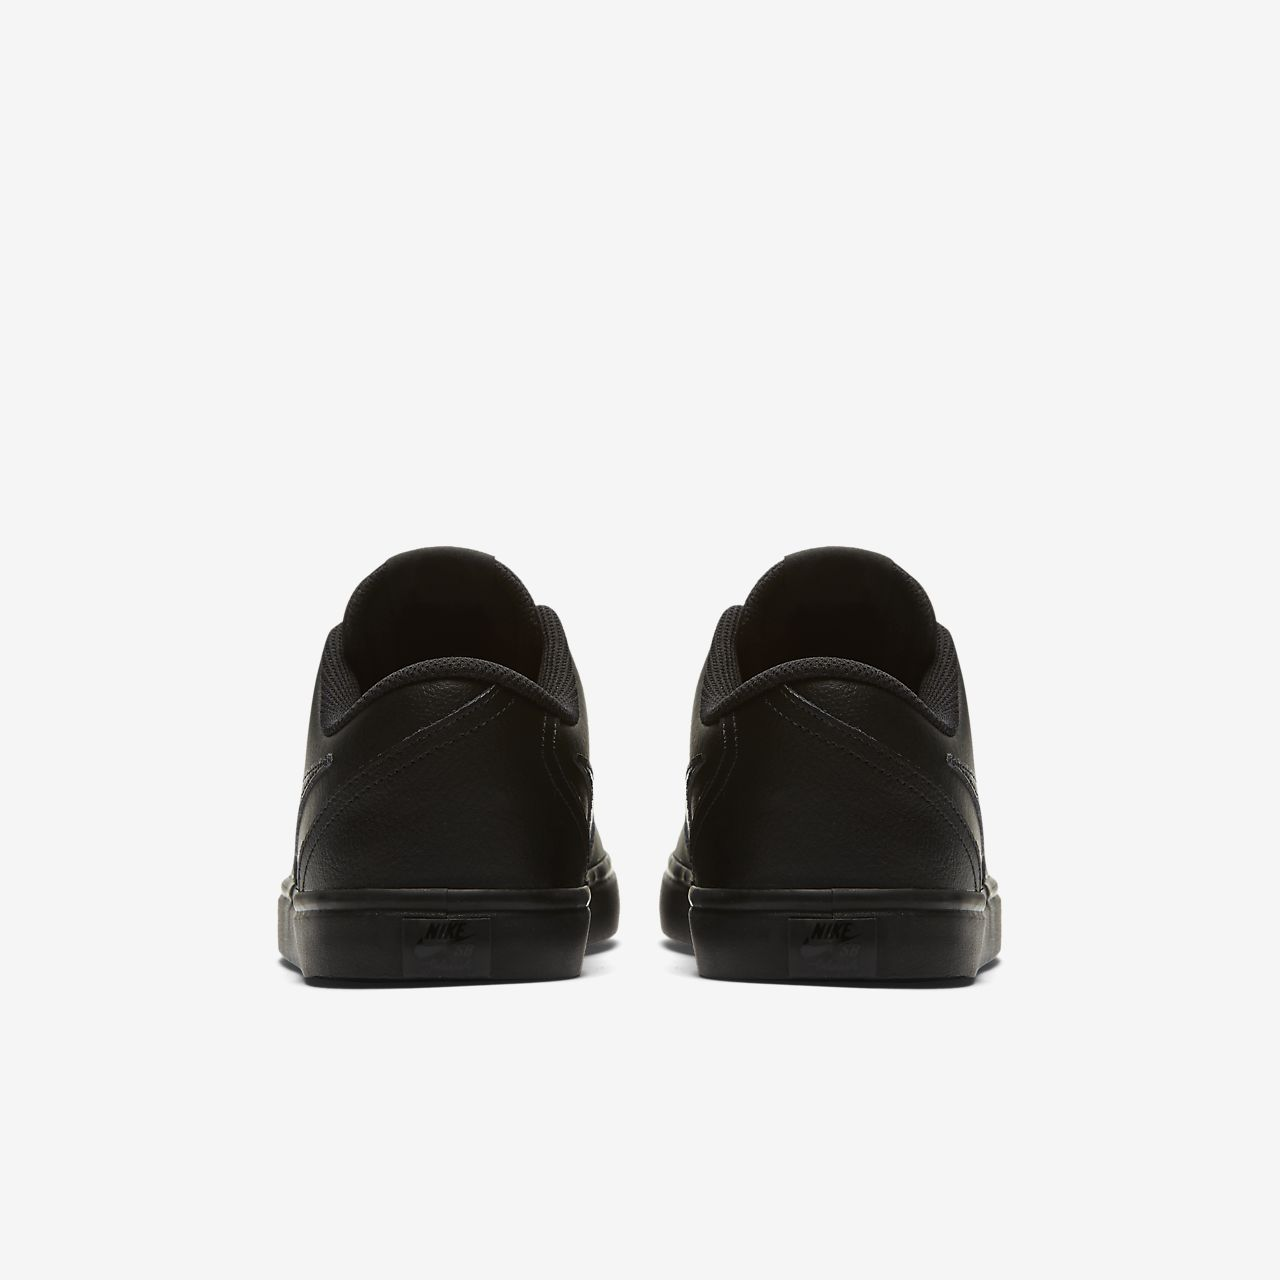 Sapatilhas de skateboard Nike SB Check Solarsoft para homem